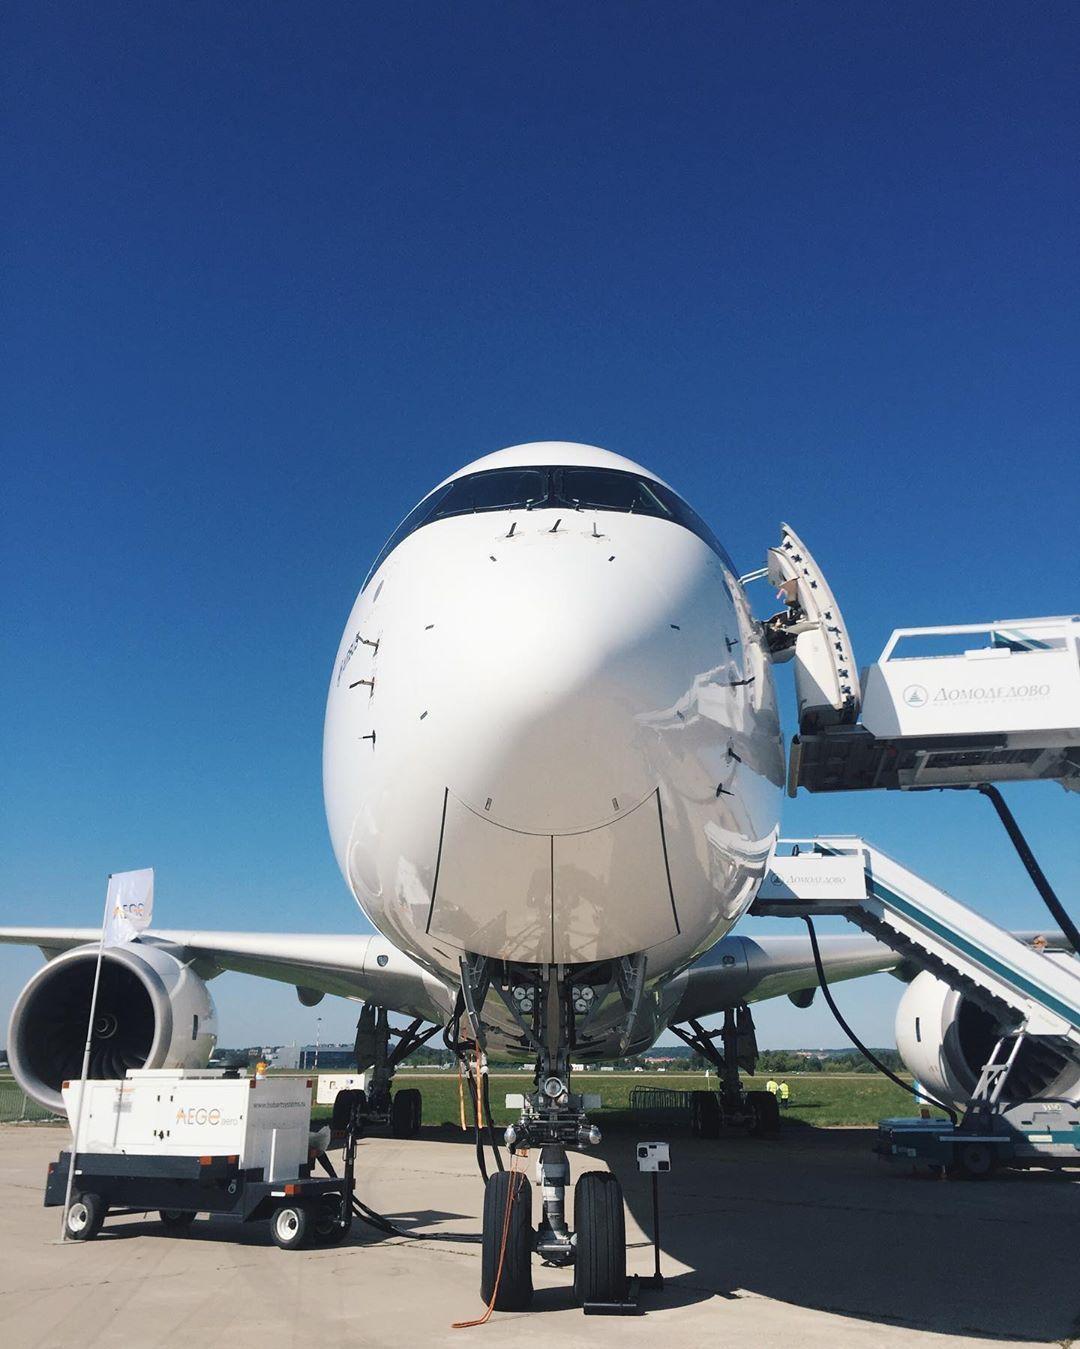 aircraft airport plane aviation Emirates flights